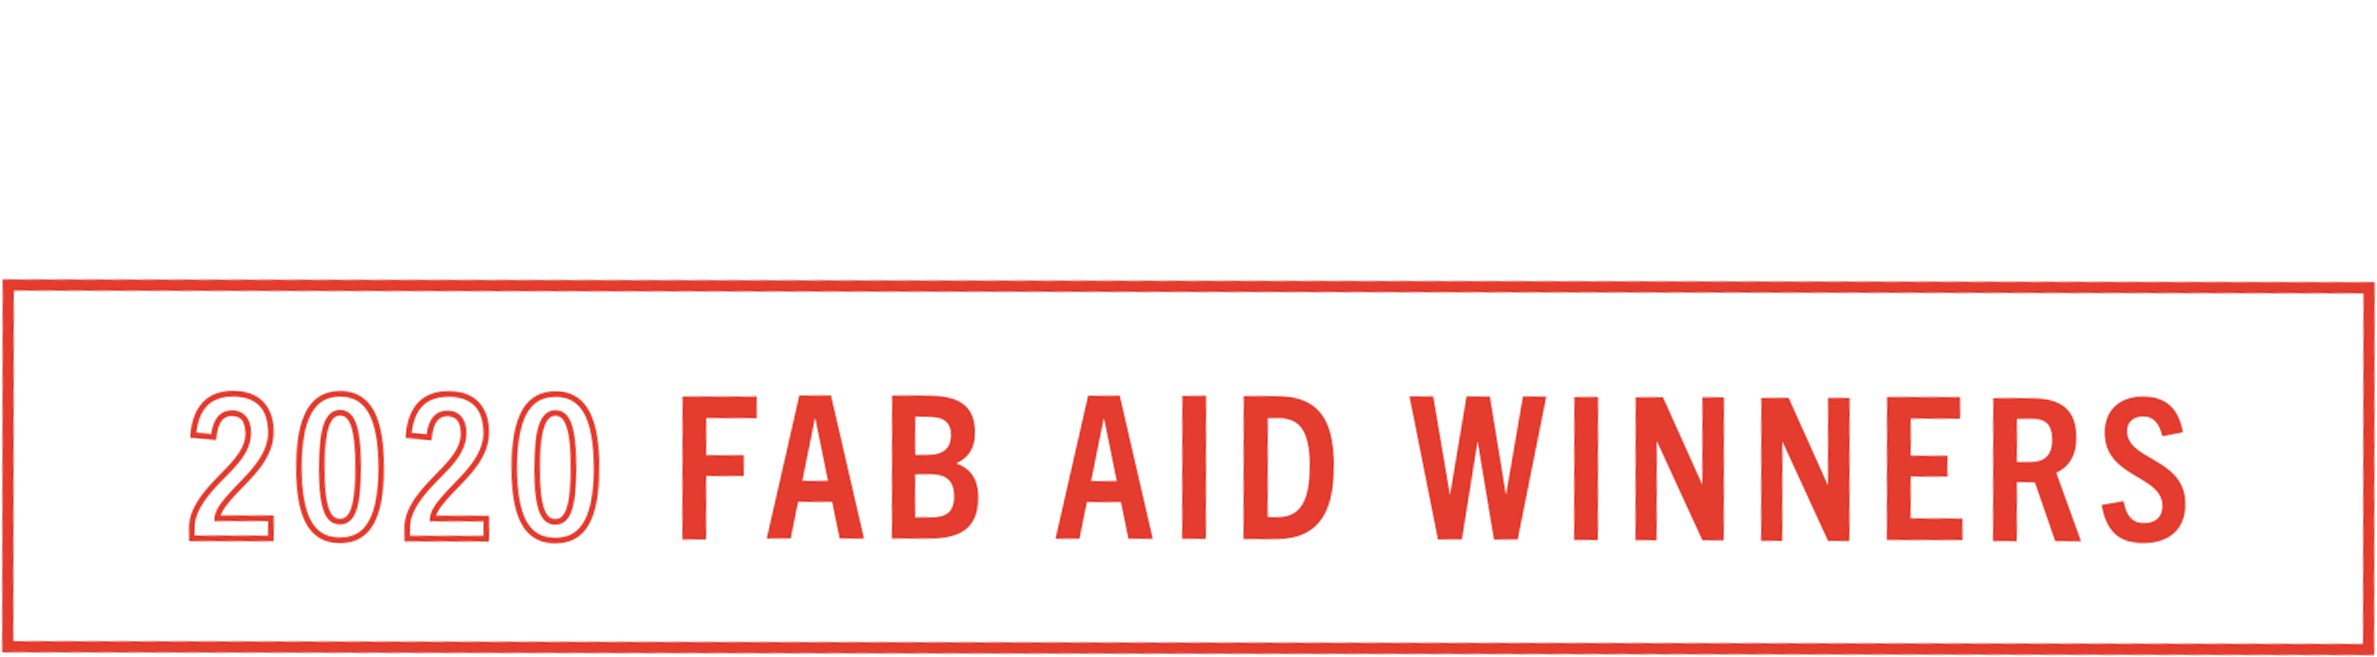 FAB_aid_winners